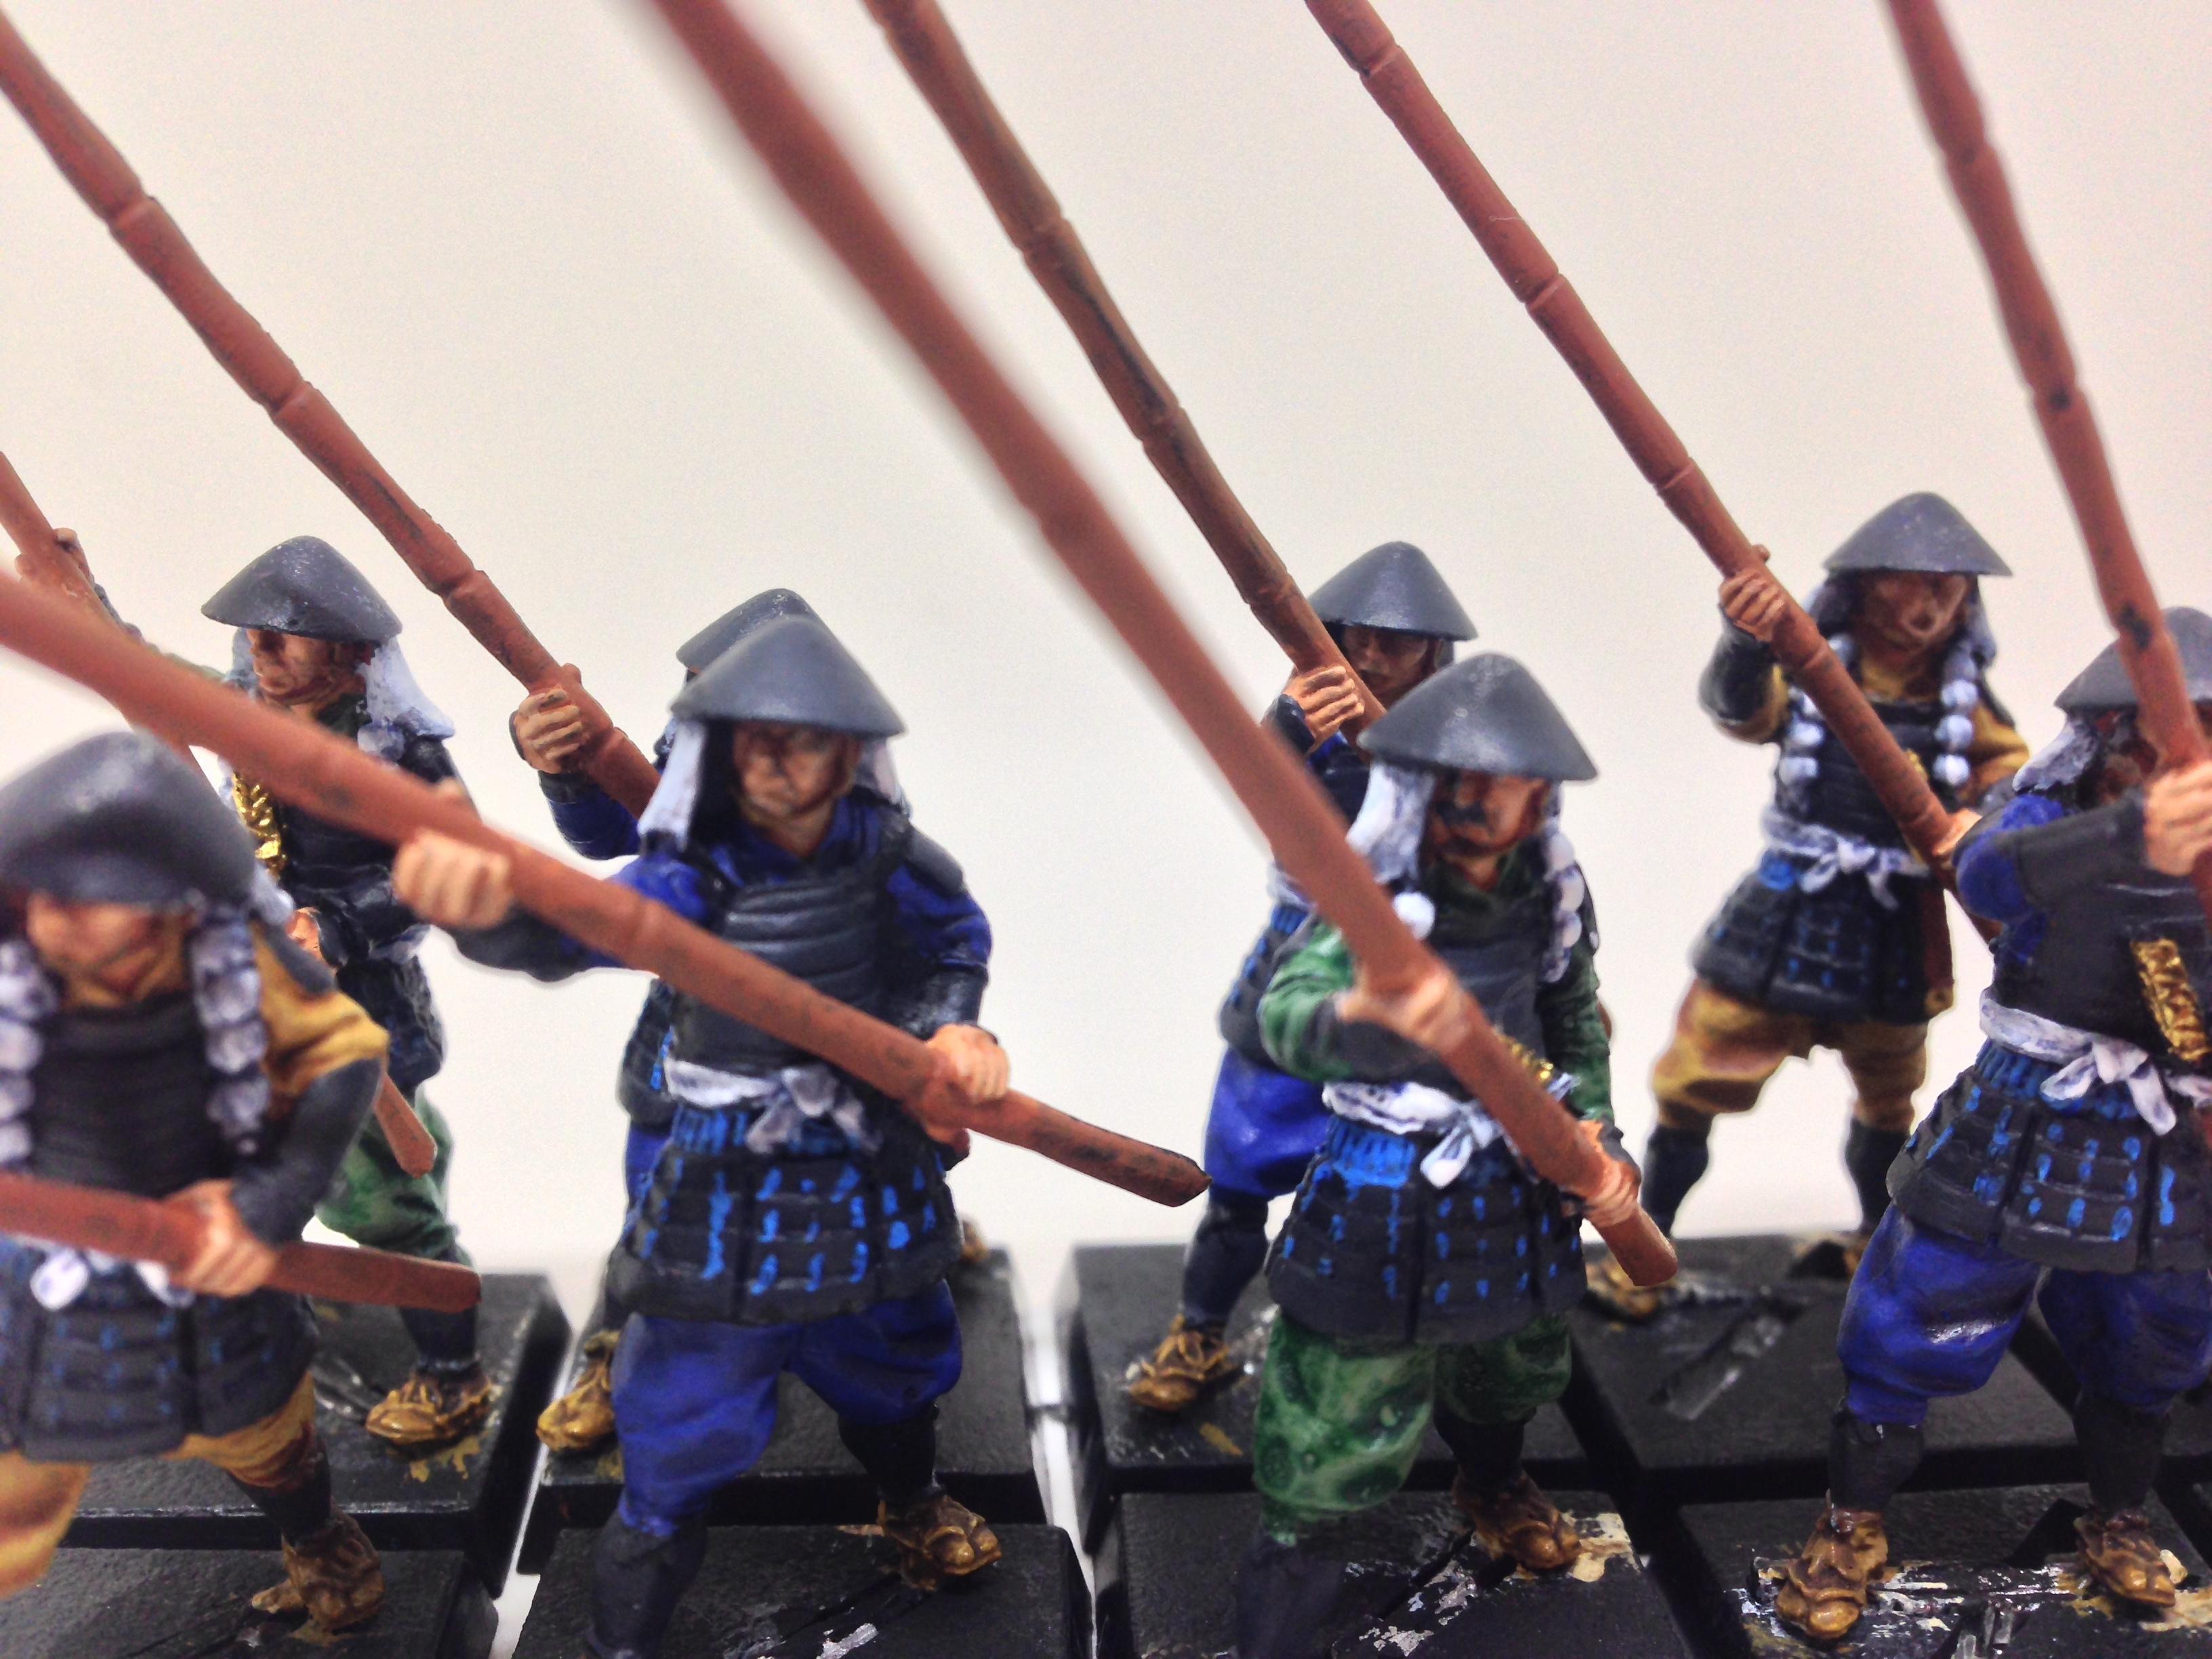 Samurai, Zenit ashiaru with yari close up